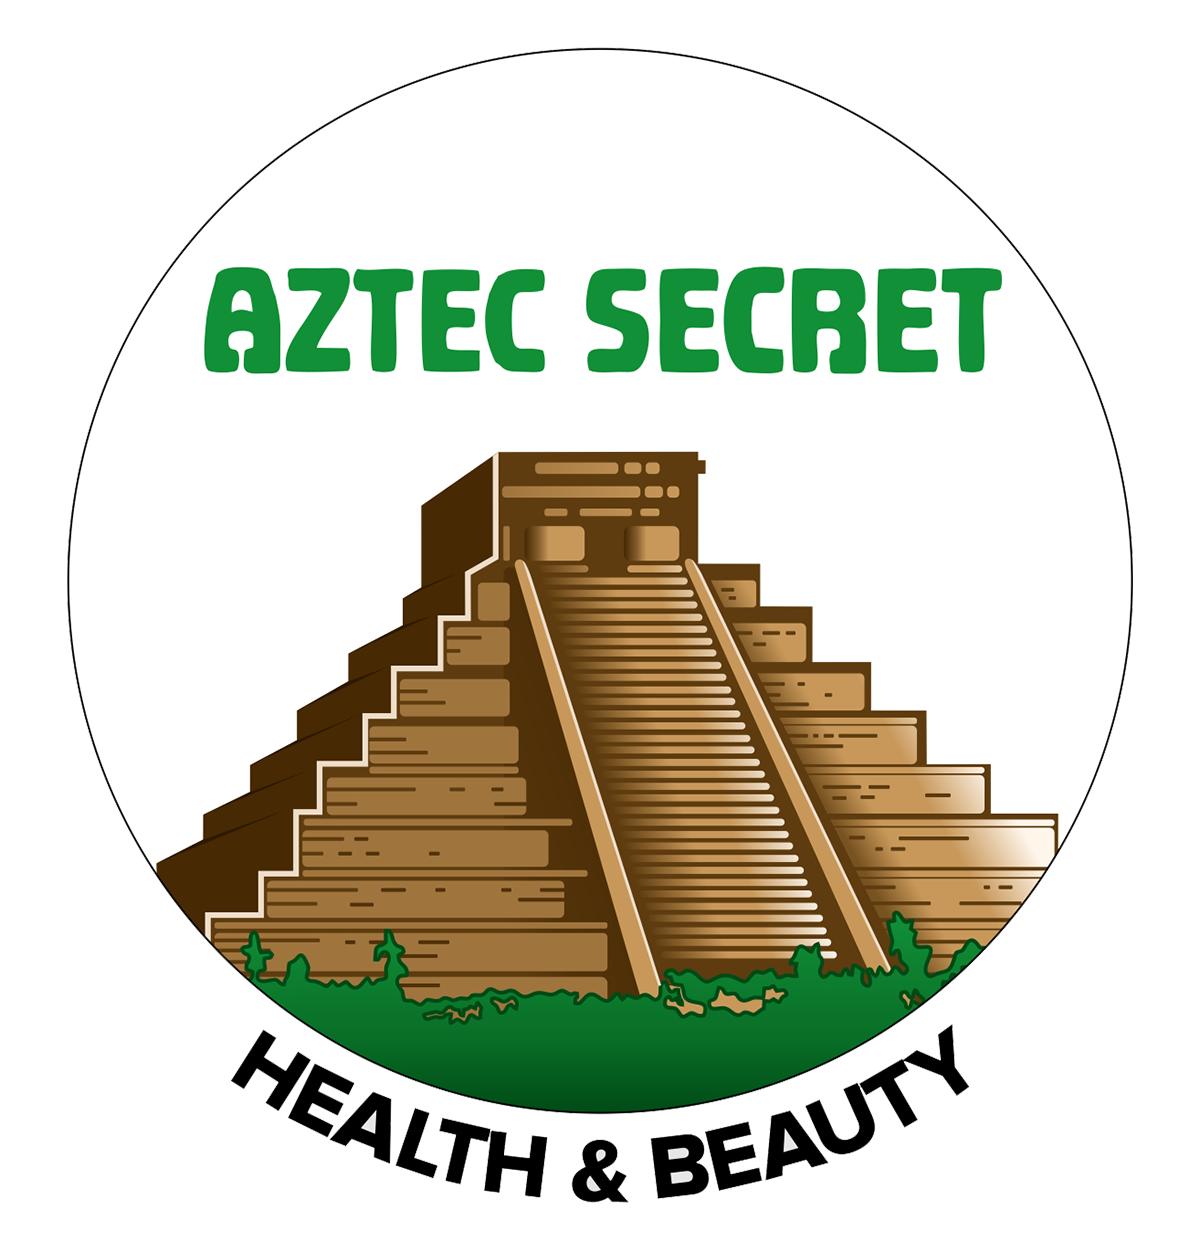 aztec secret ازتيك